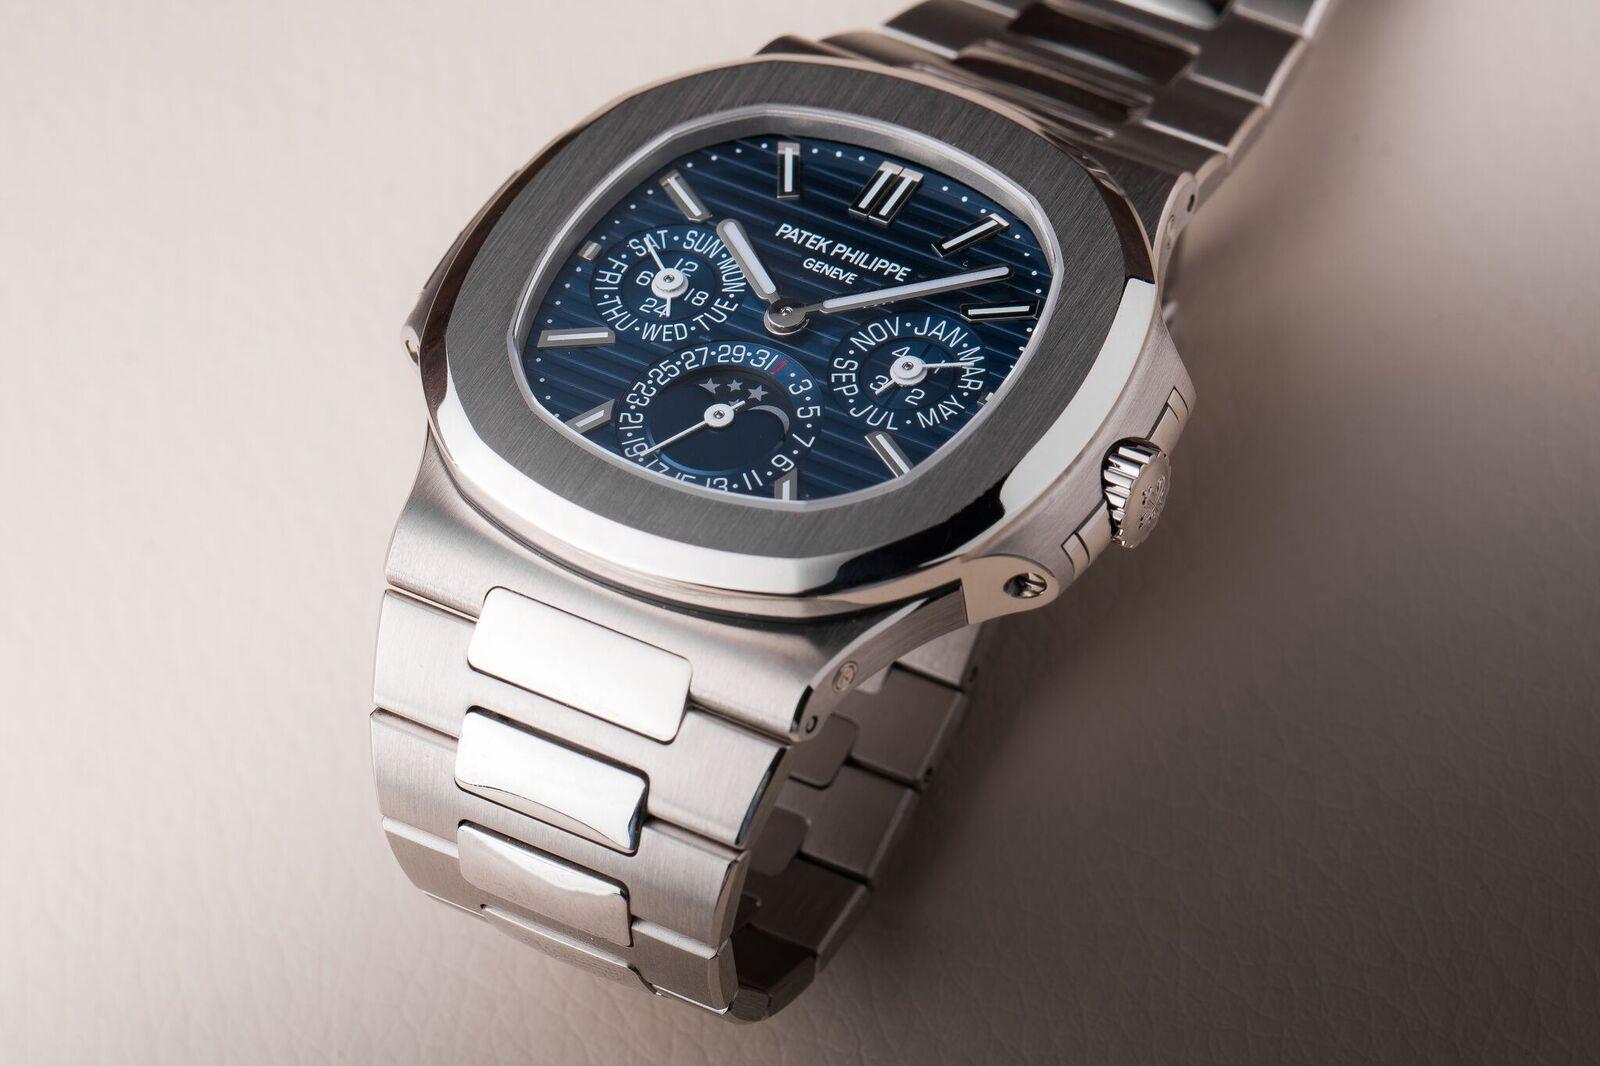 Copy Patek Philippe Nautilus Perpetual Calendar Ref.5740/1G Replica Watches From China